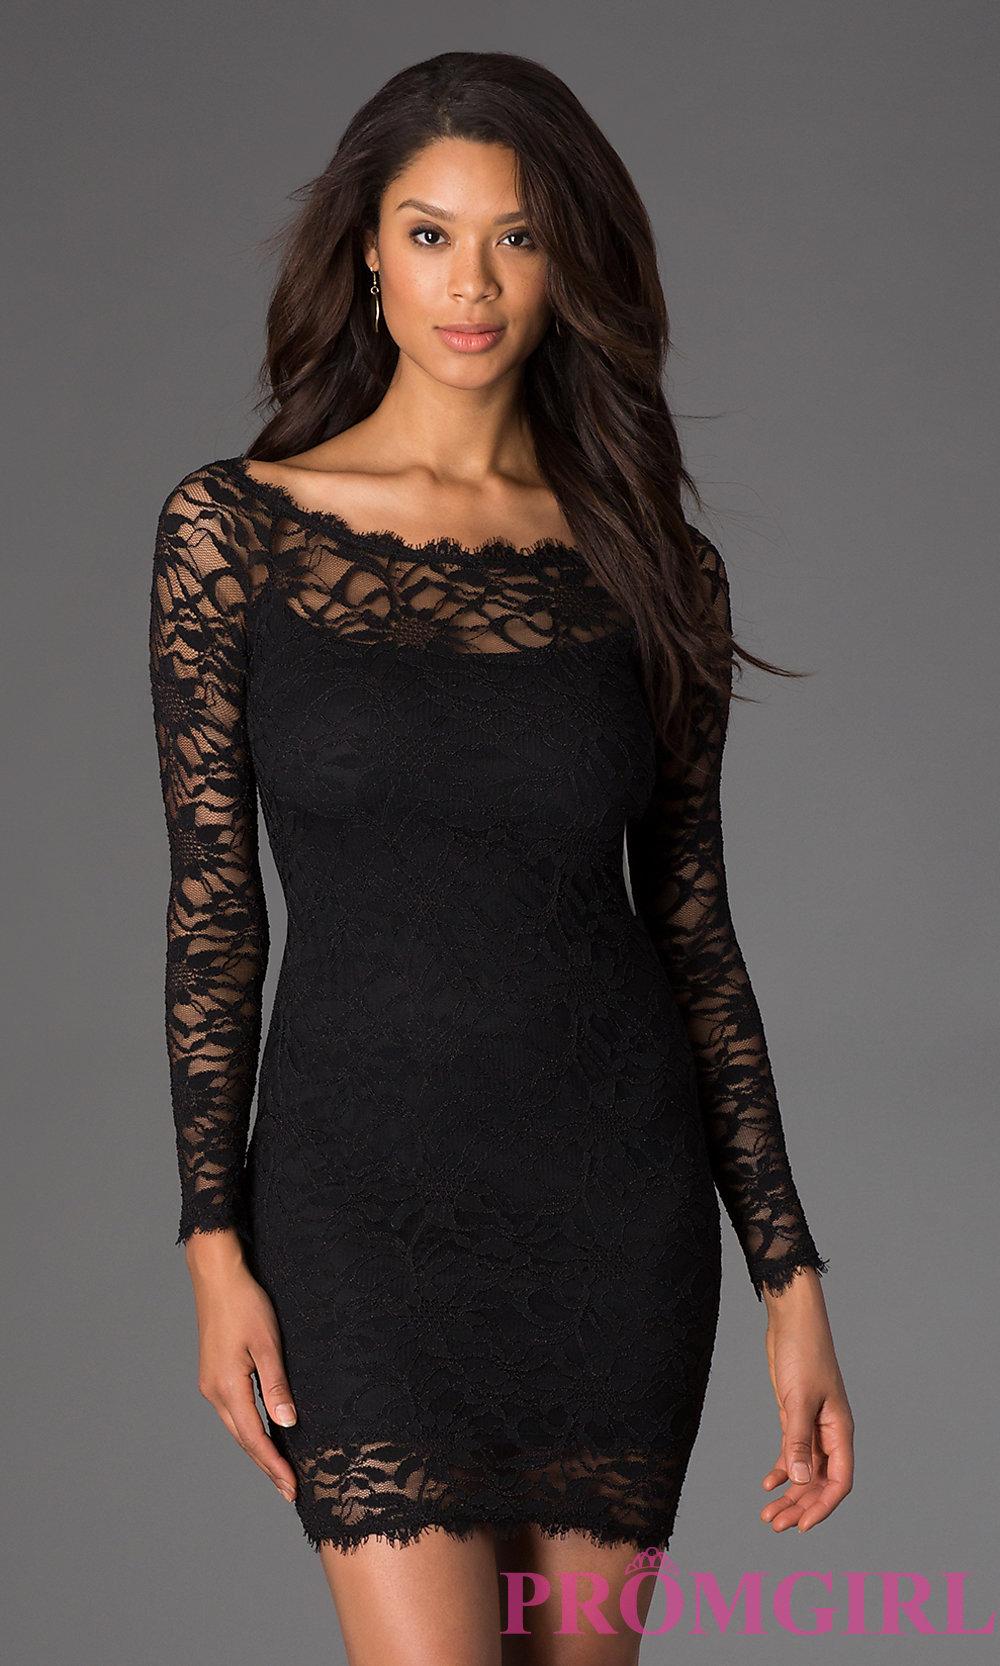 black lace dress hover to zoom · image of short black lace long sleeve dress ... ZASKHNA